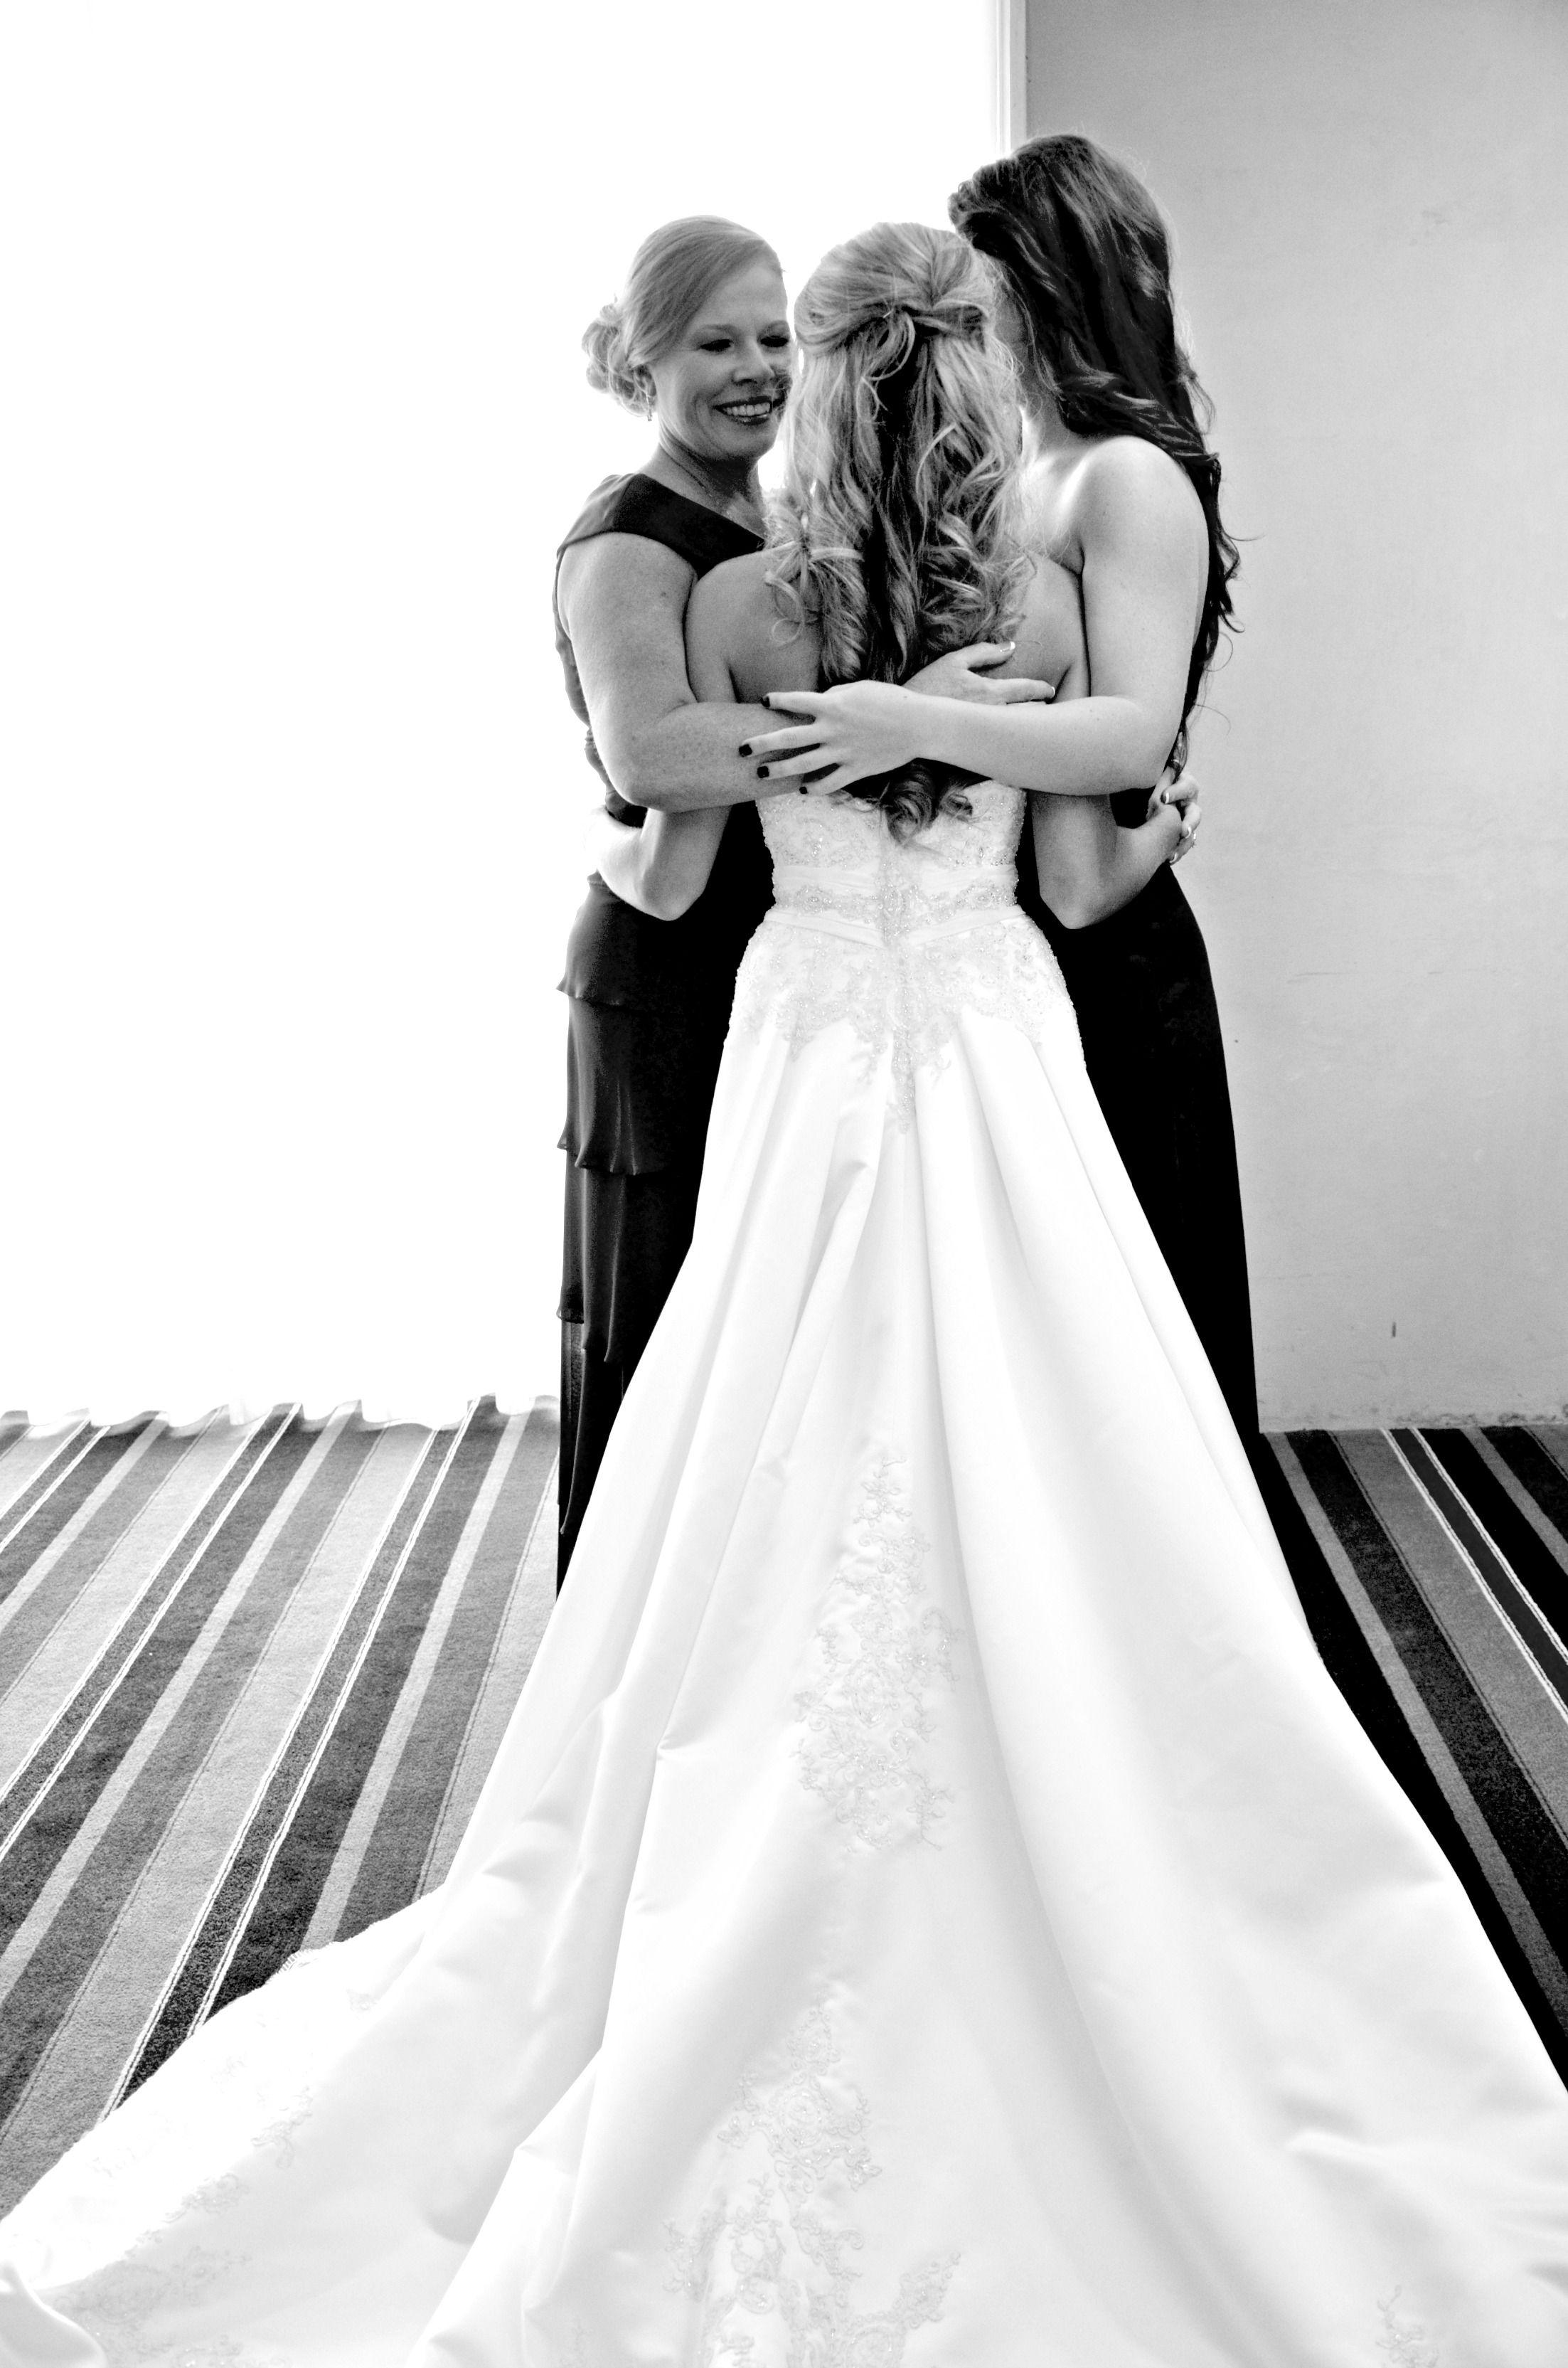 sassen_verstraaten-slides018 | bruiloft | Pinterest | Wedding ...